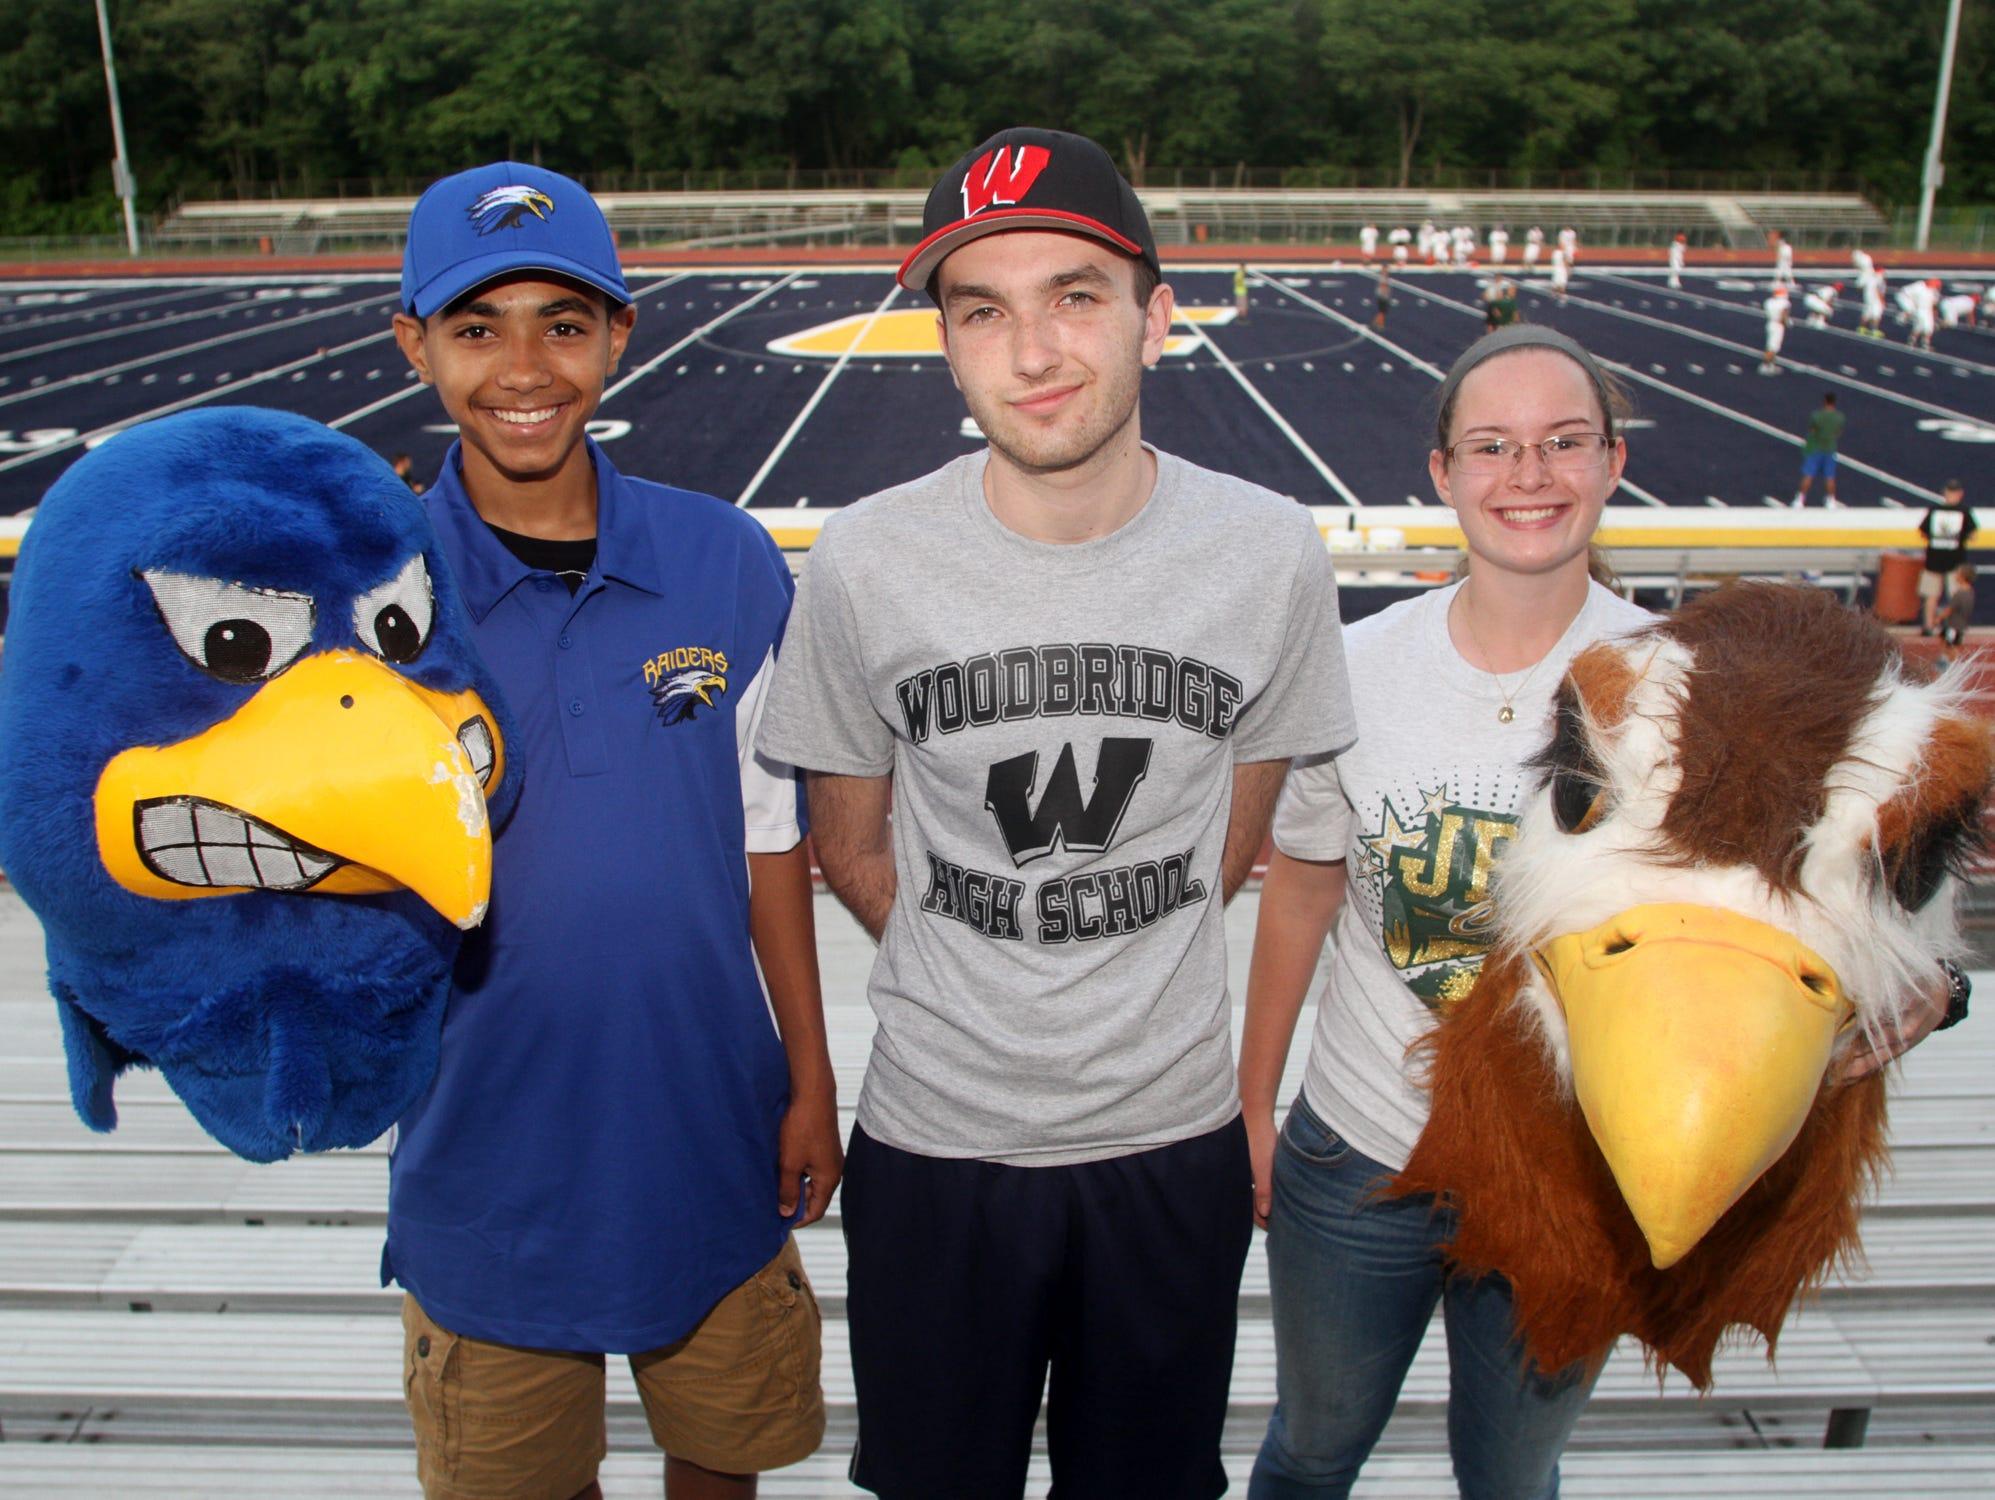 North Brunswick mascot Brian Jones, left, Woodbridge mascot Johnathon O'Halloran, center, and JP Stevens mascot Amanda Lombardi, Wednesday, at Colonia High School in Woodbridge, NJ.